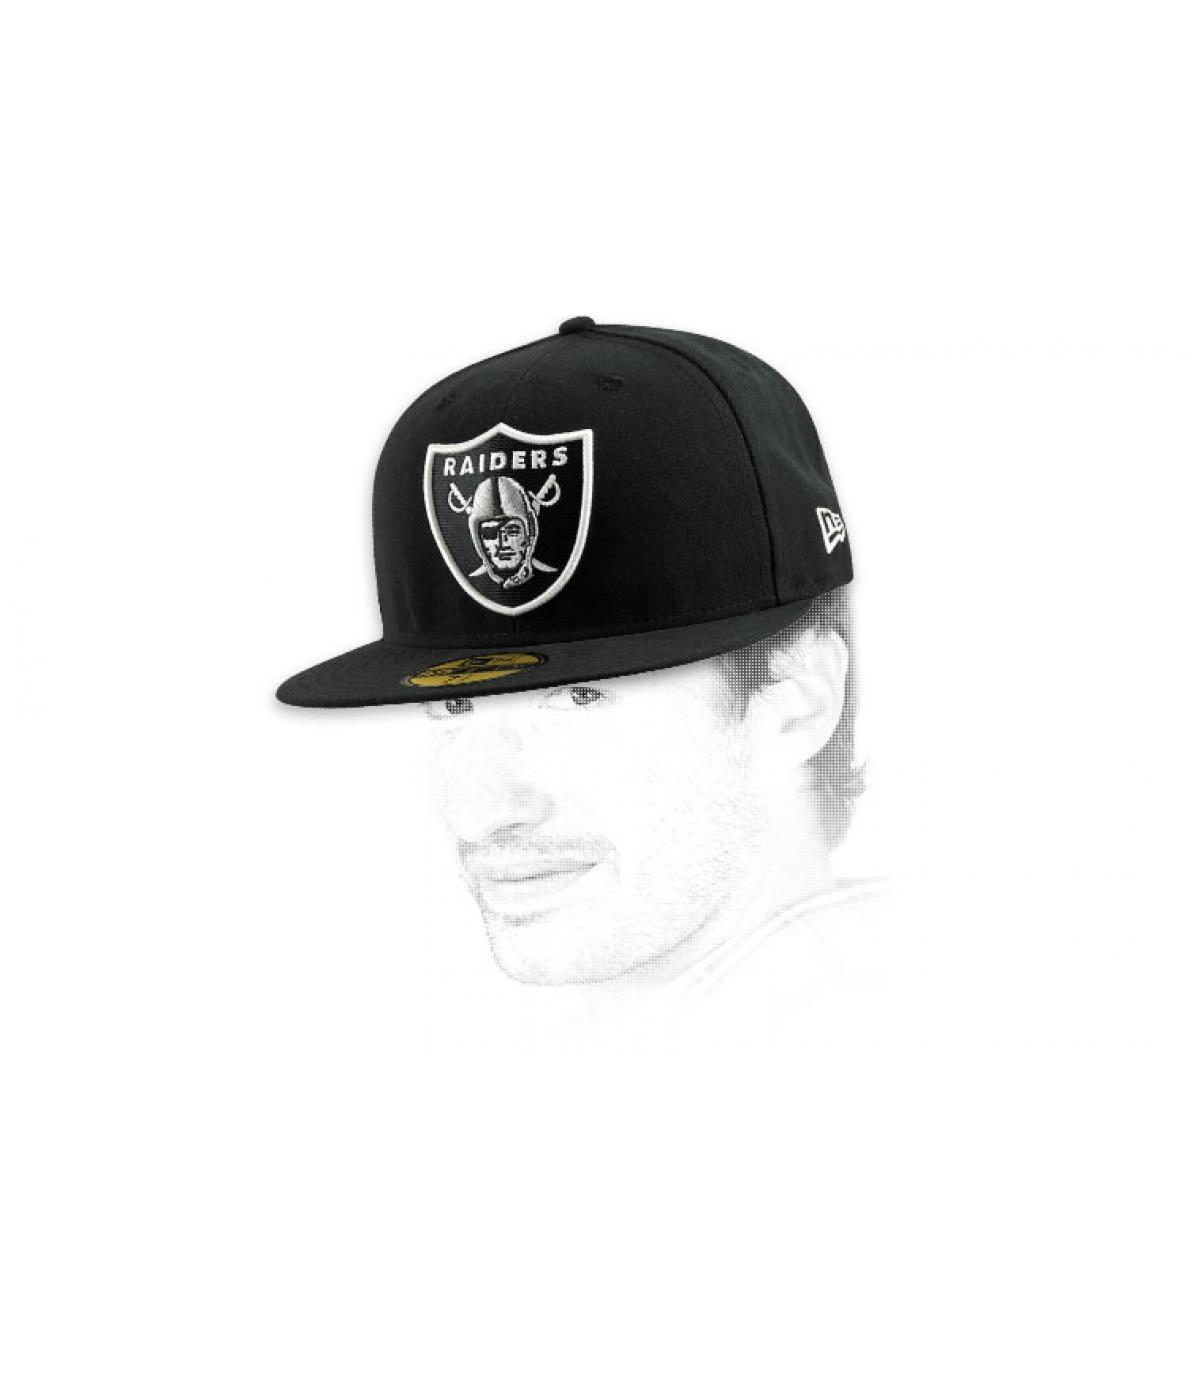 Detalles Cap Raiders NFL imagen 6